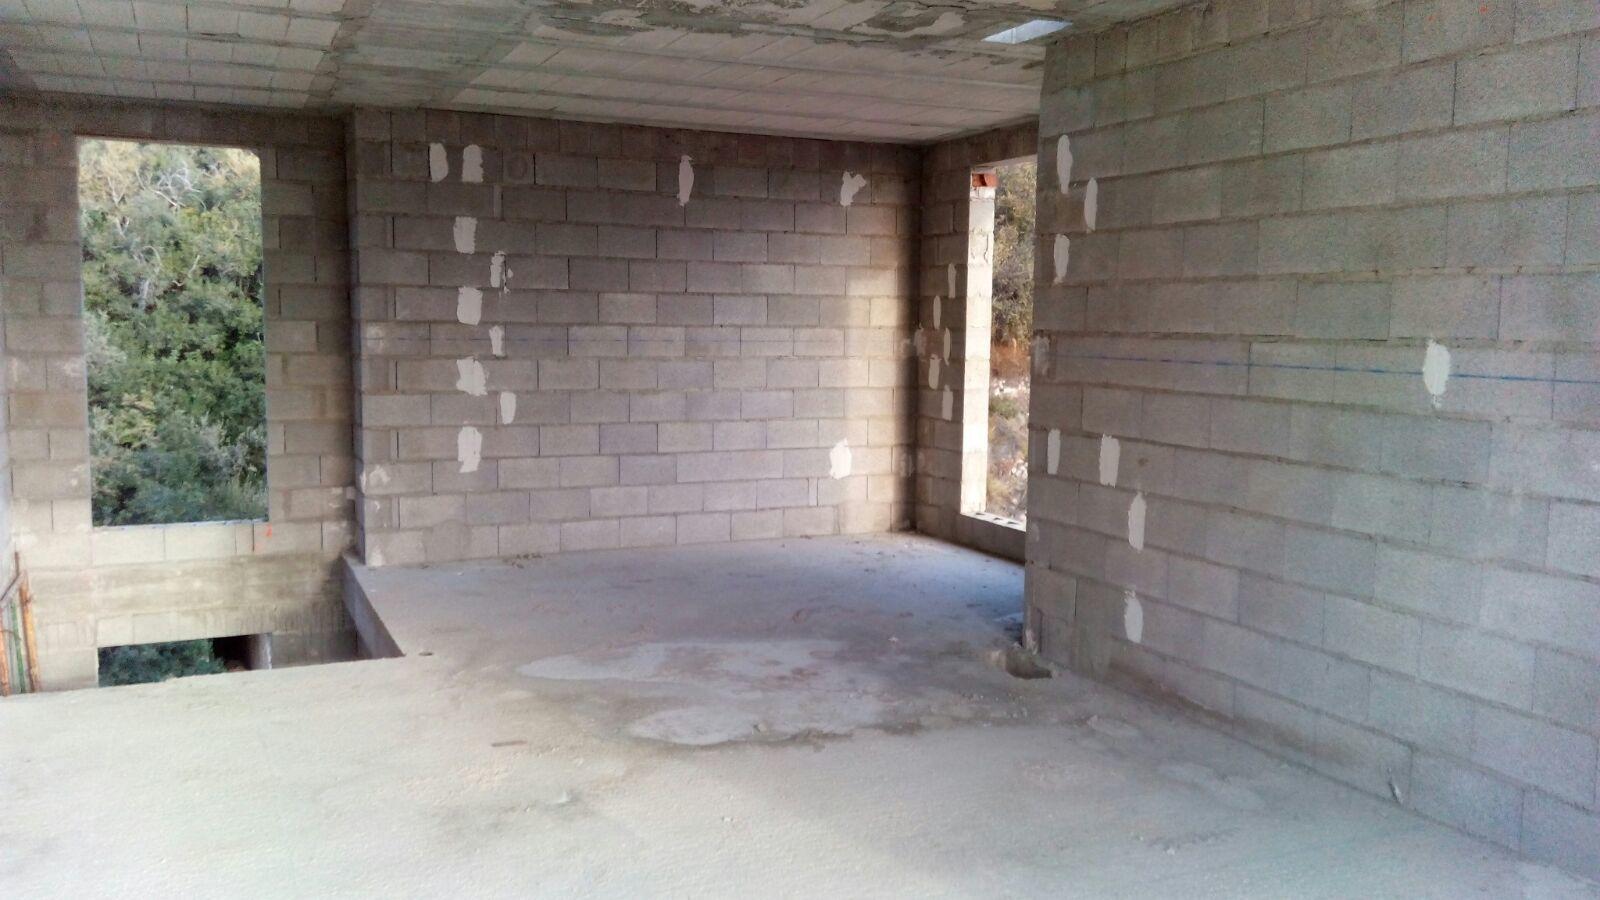 Foto 23 de Aislamientos acústicos y térmicos en Rafelcofer | Aislamientos de Poliuretano Jaime Femenia